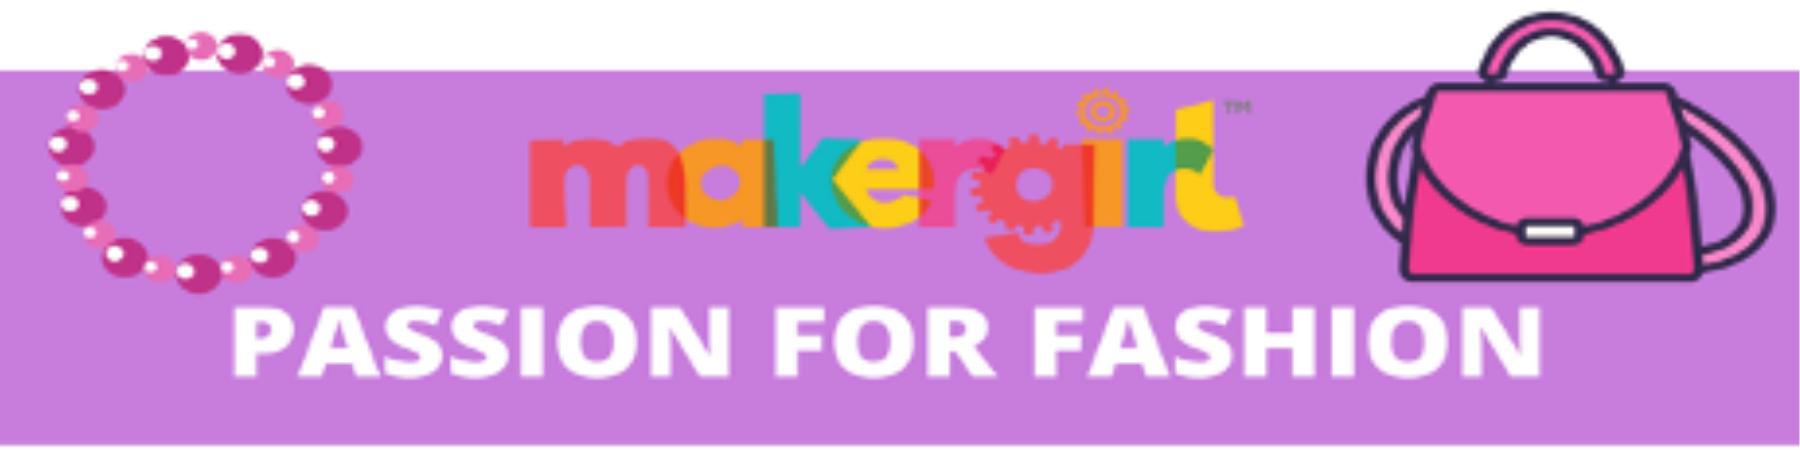 Kent State University Design Innovation MakerGirl 2021